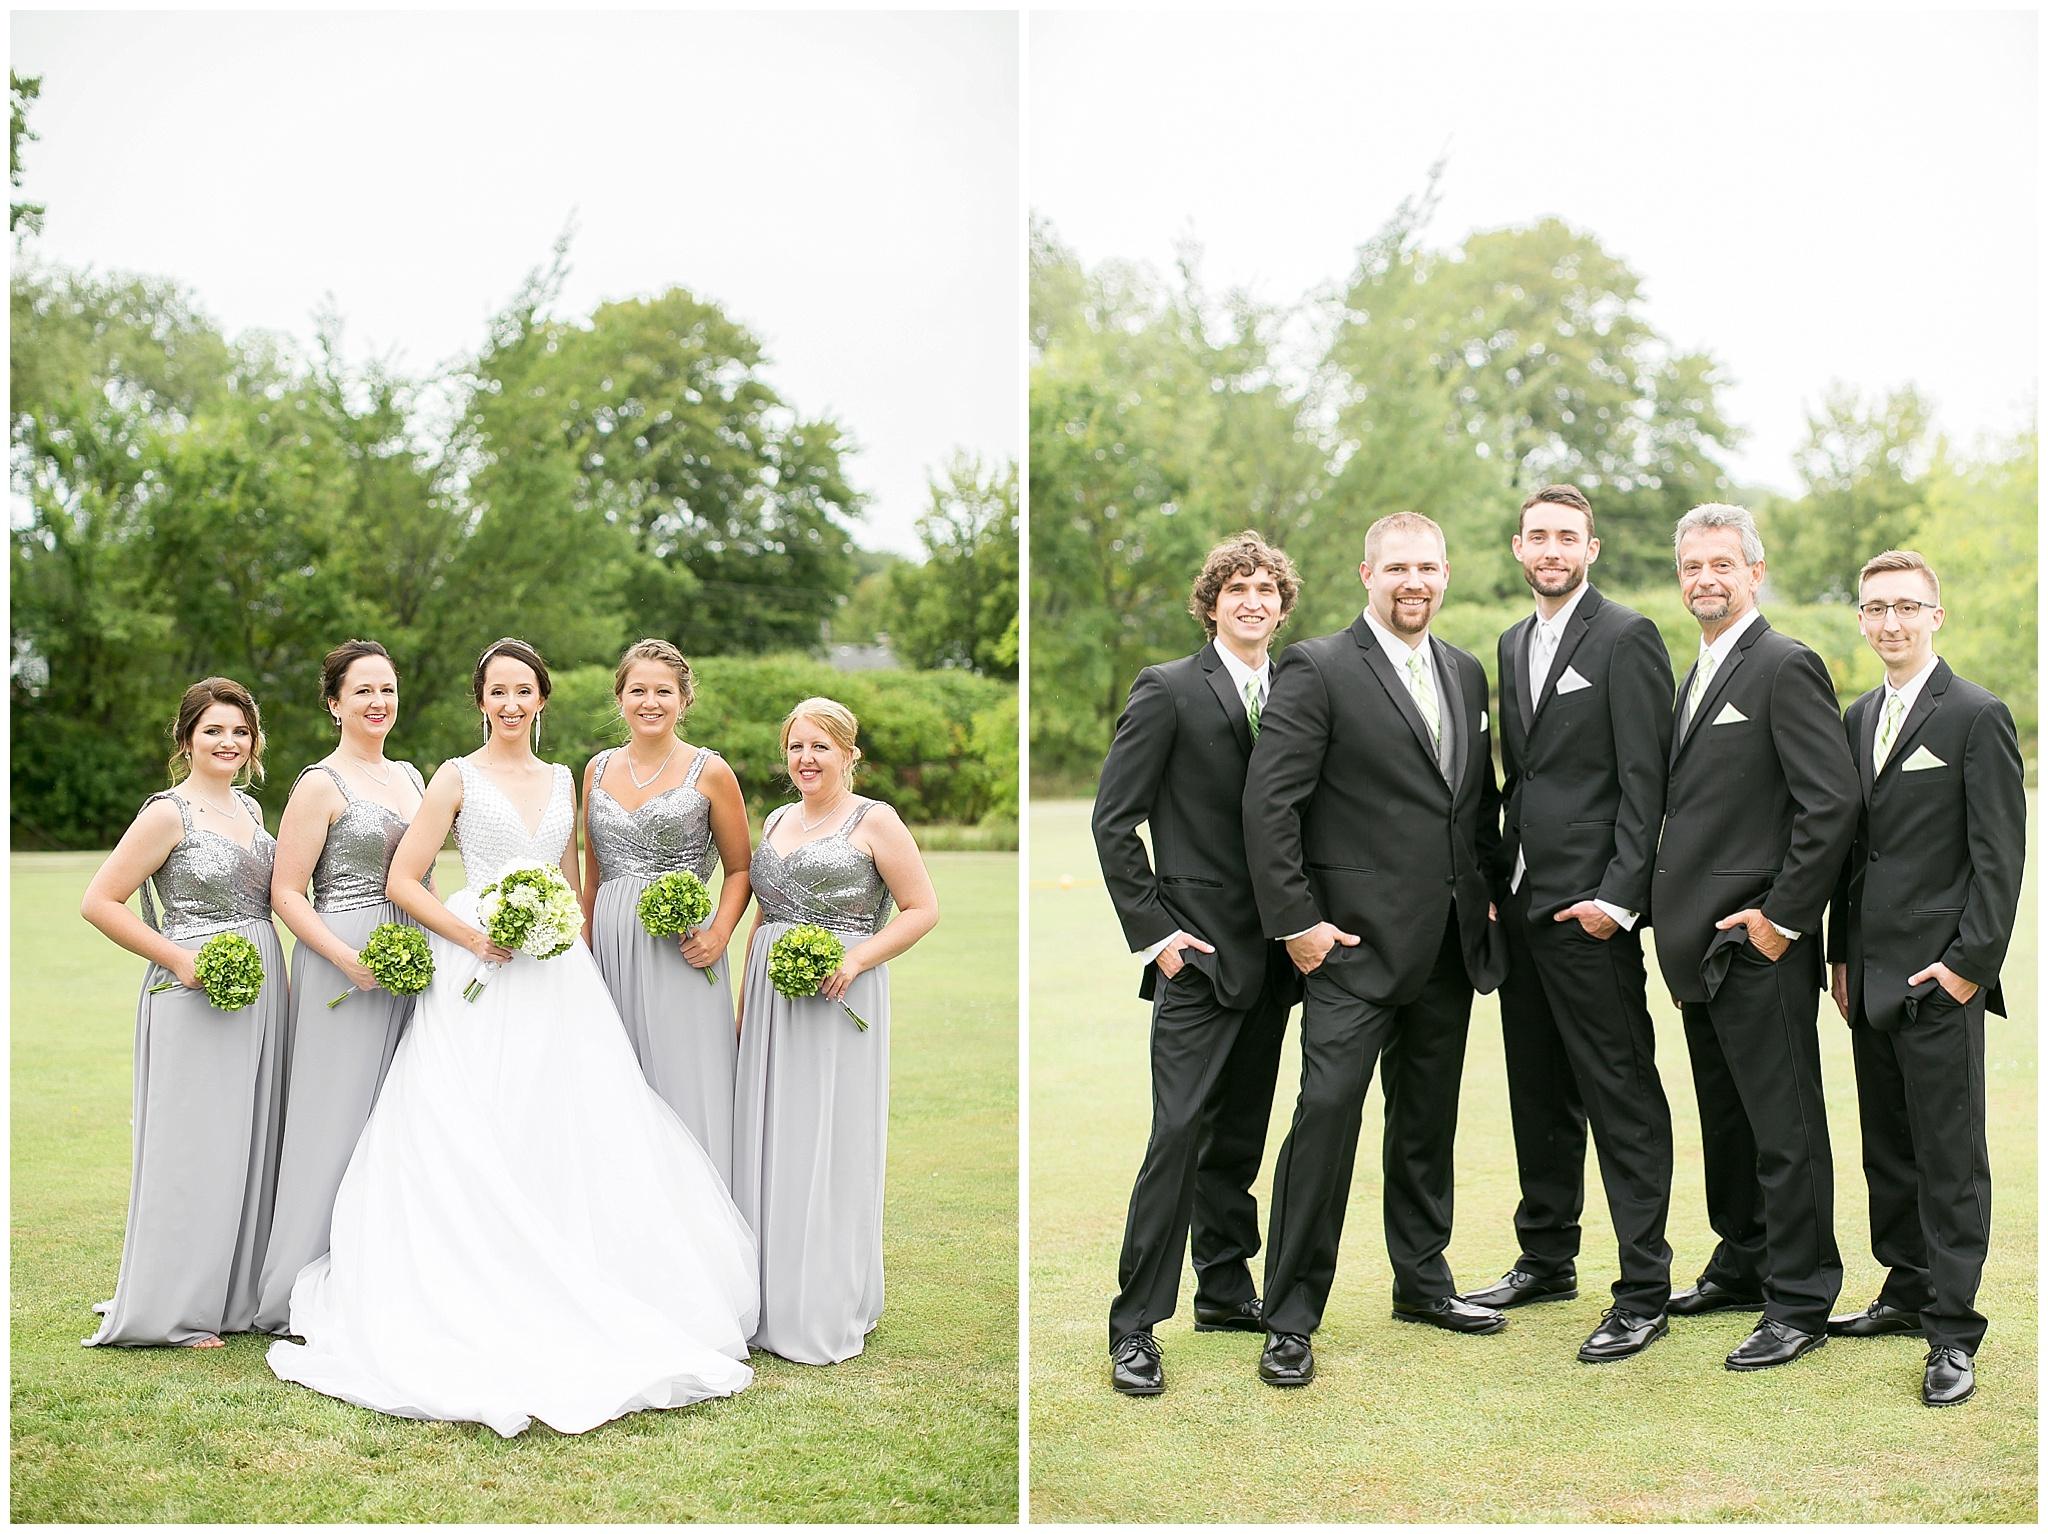 bridgewood_resort_wedding_neenah_wisconsin_0315.jpg